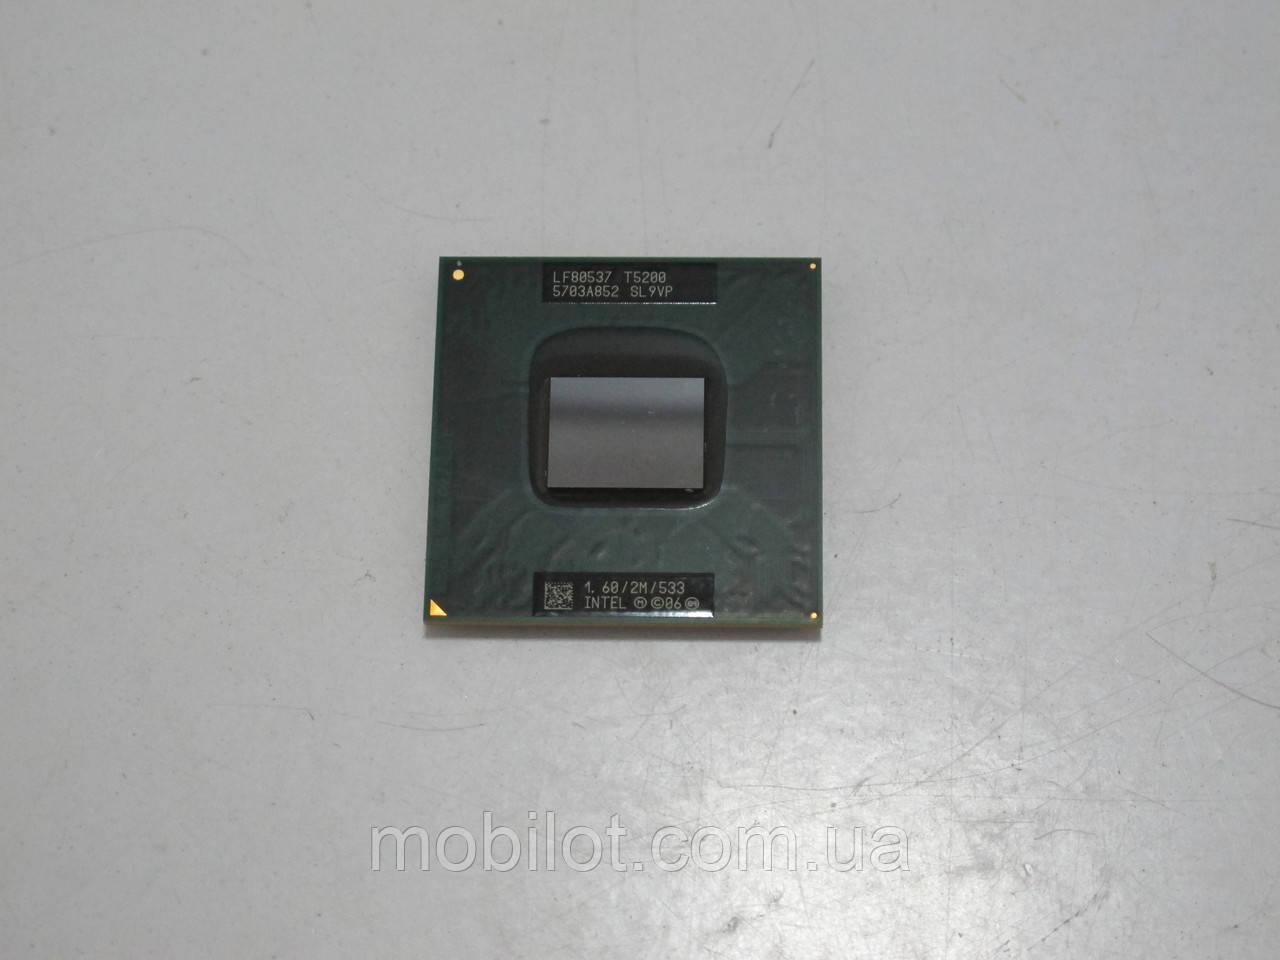 Процессор Intel Core 2 Duo T5200 (NZ-7151)